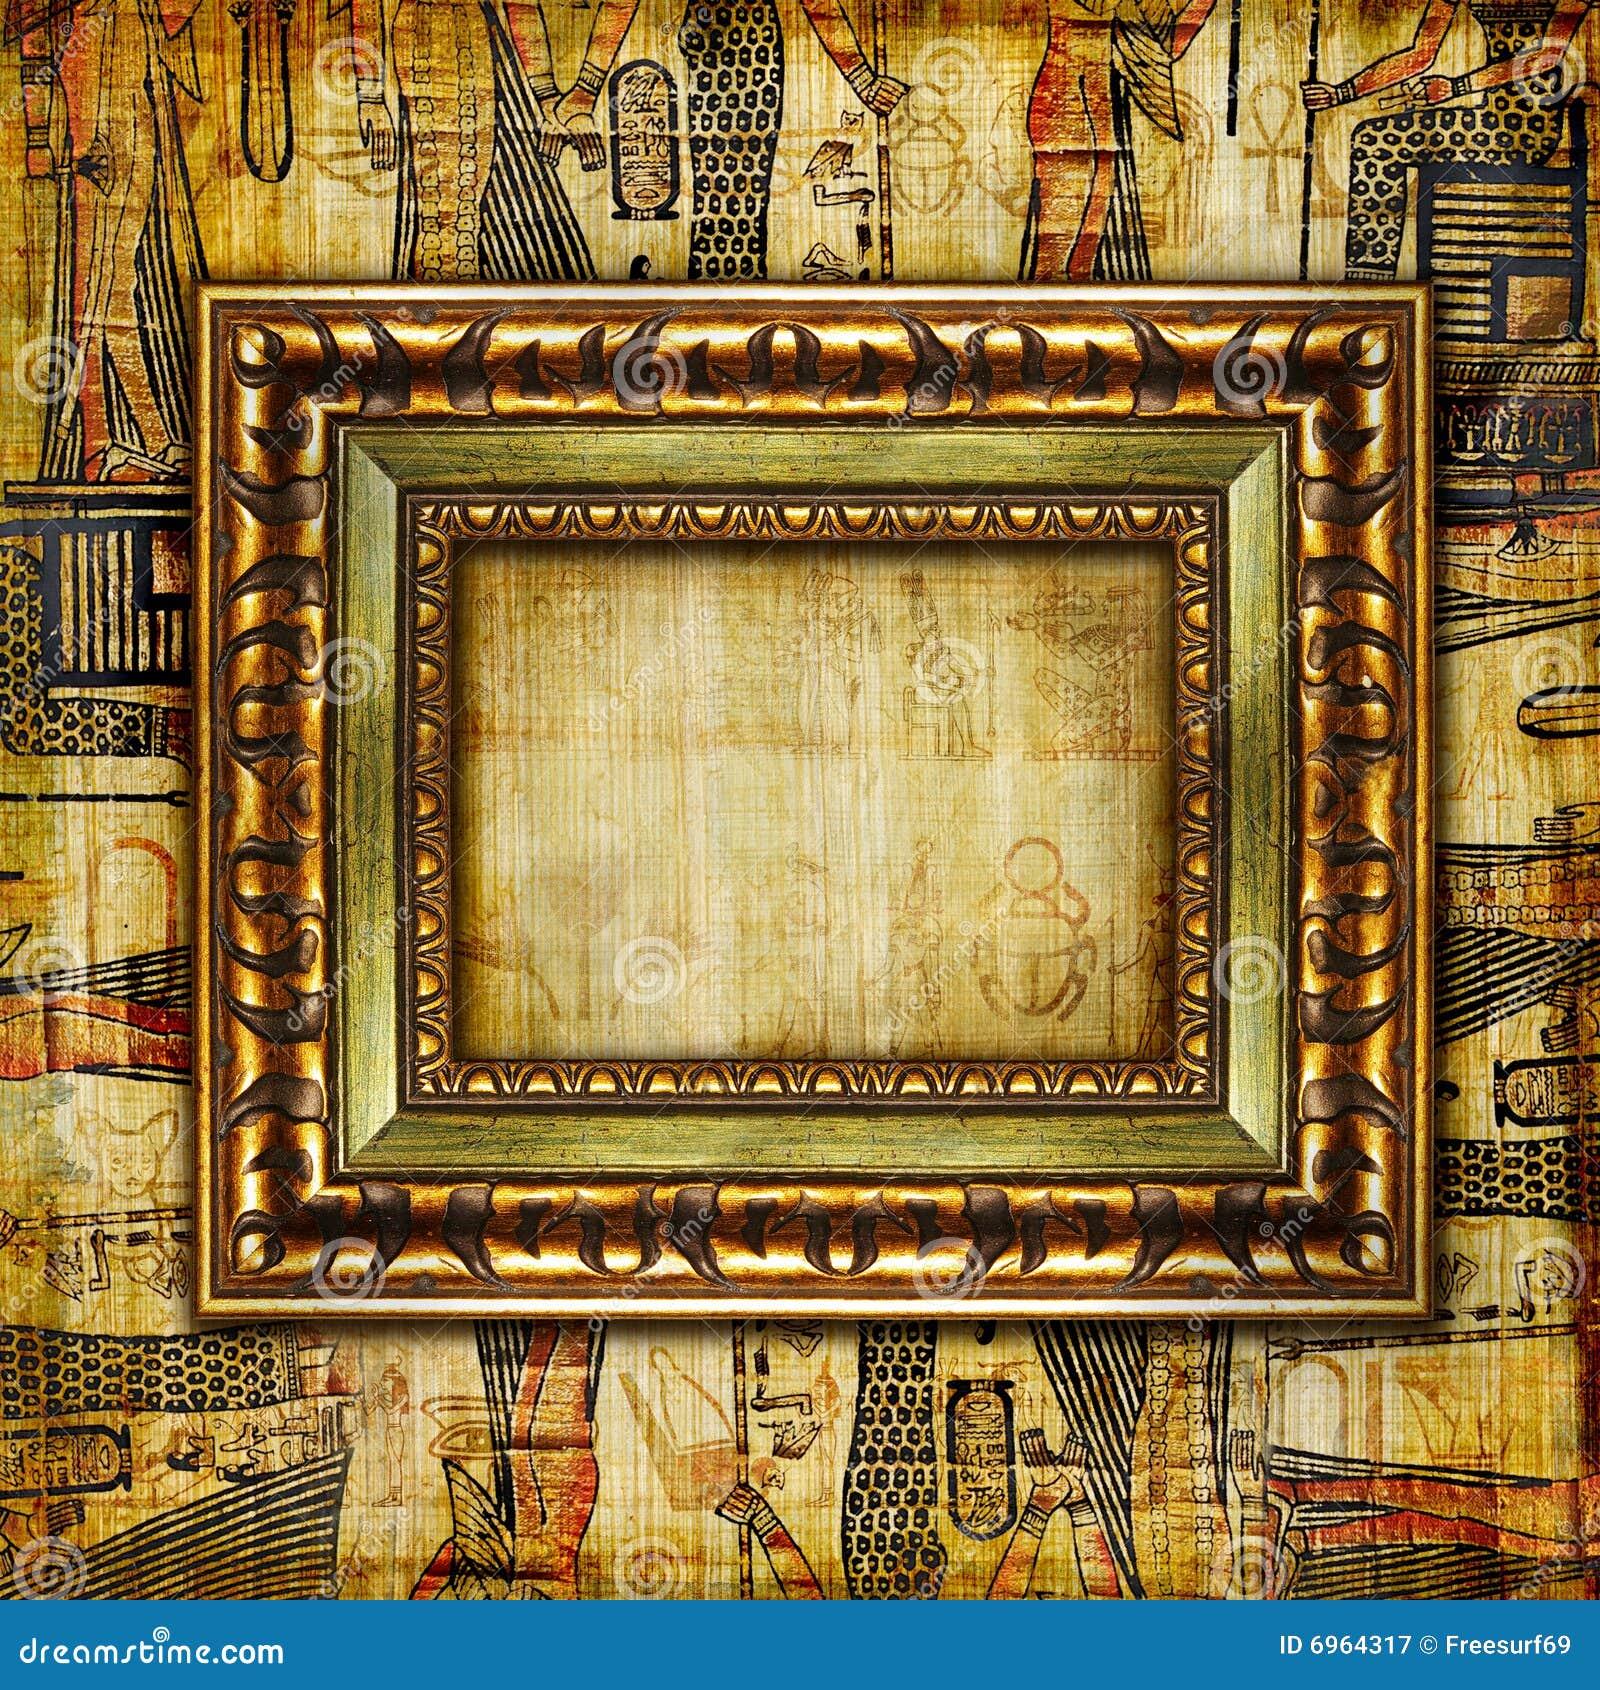 Dorable Egypt Wall Art Vignette - Art & Wall Decor - hecatalog.info